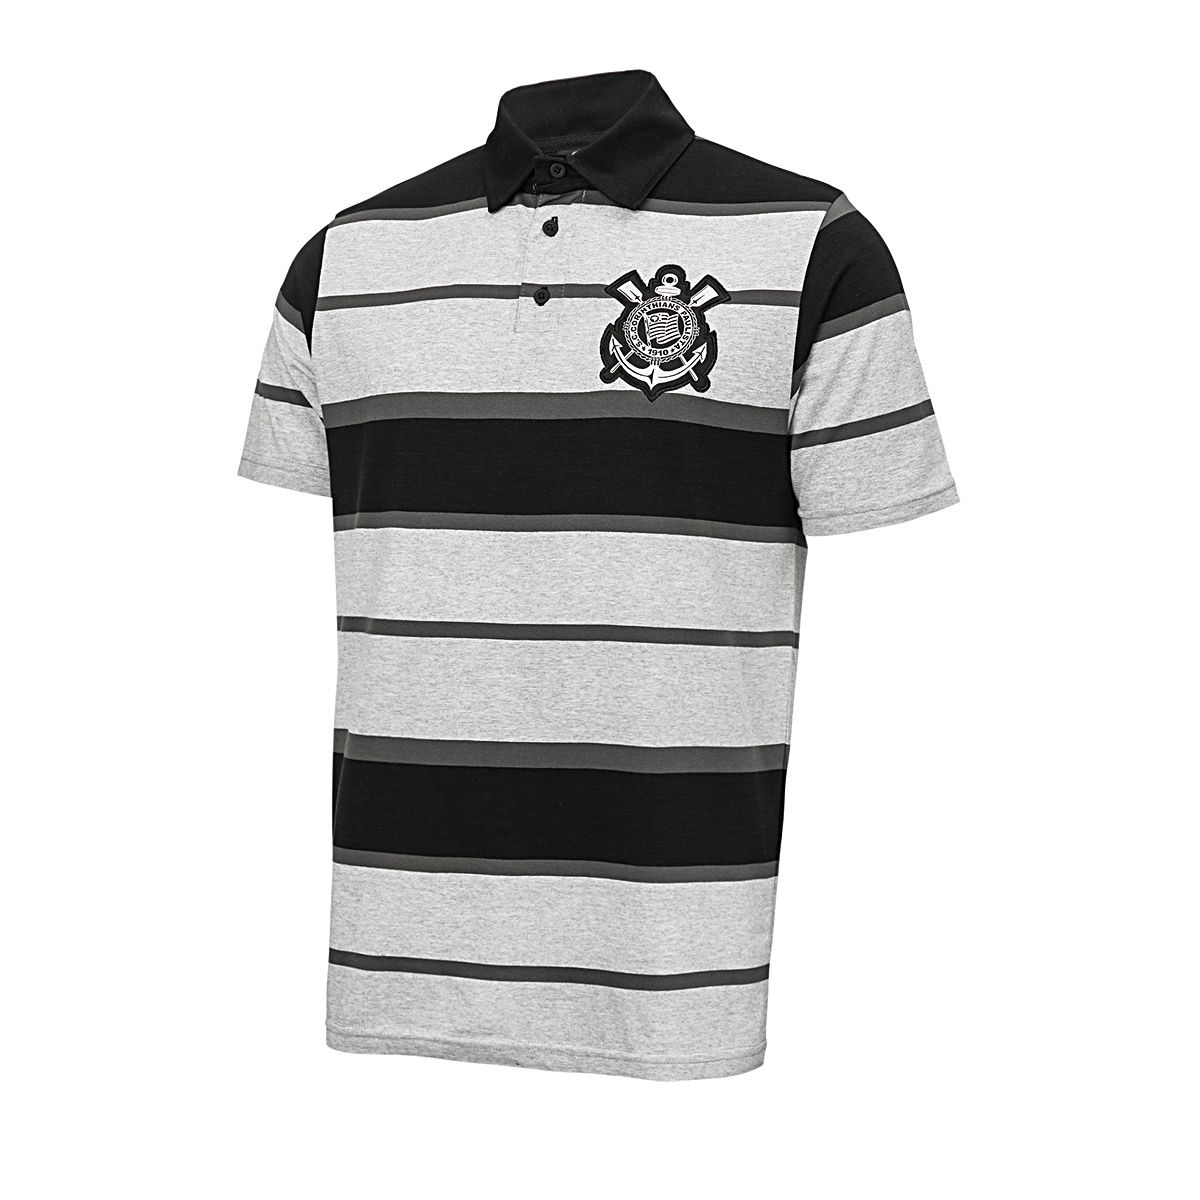 Camisa Polo Corinthians Mescla Listrada Masculina